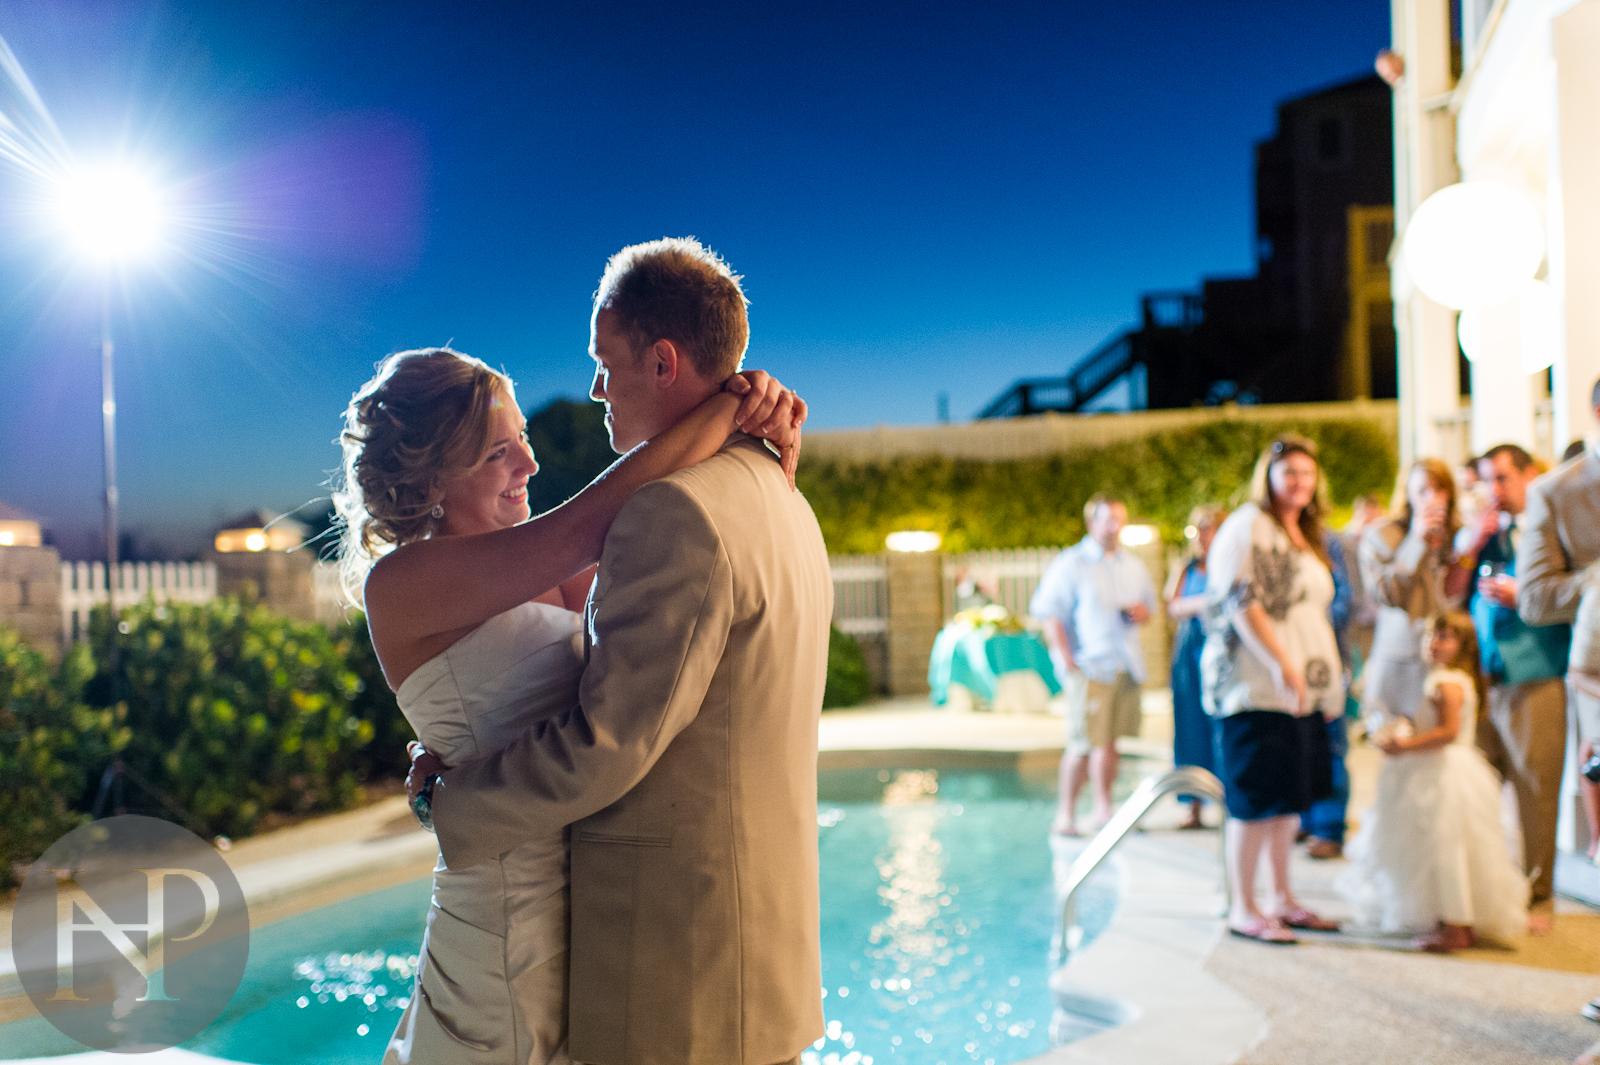 wedding photography dc photographer - district of columbia photography weddingphoto 2012_ denis kaleigh - north carolina - emerald isle - destination wedding-65.jpg